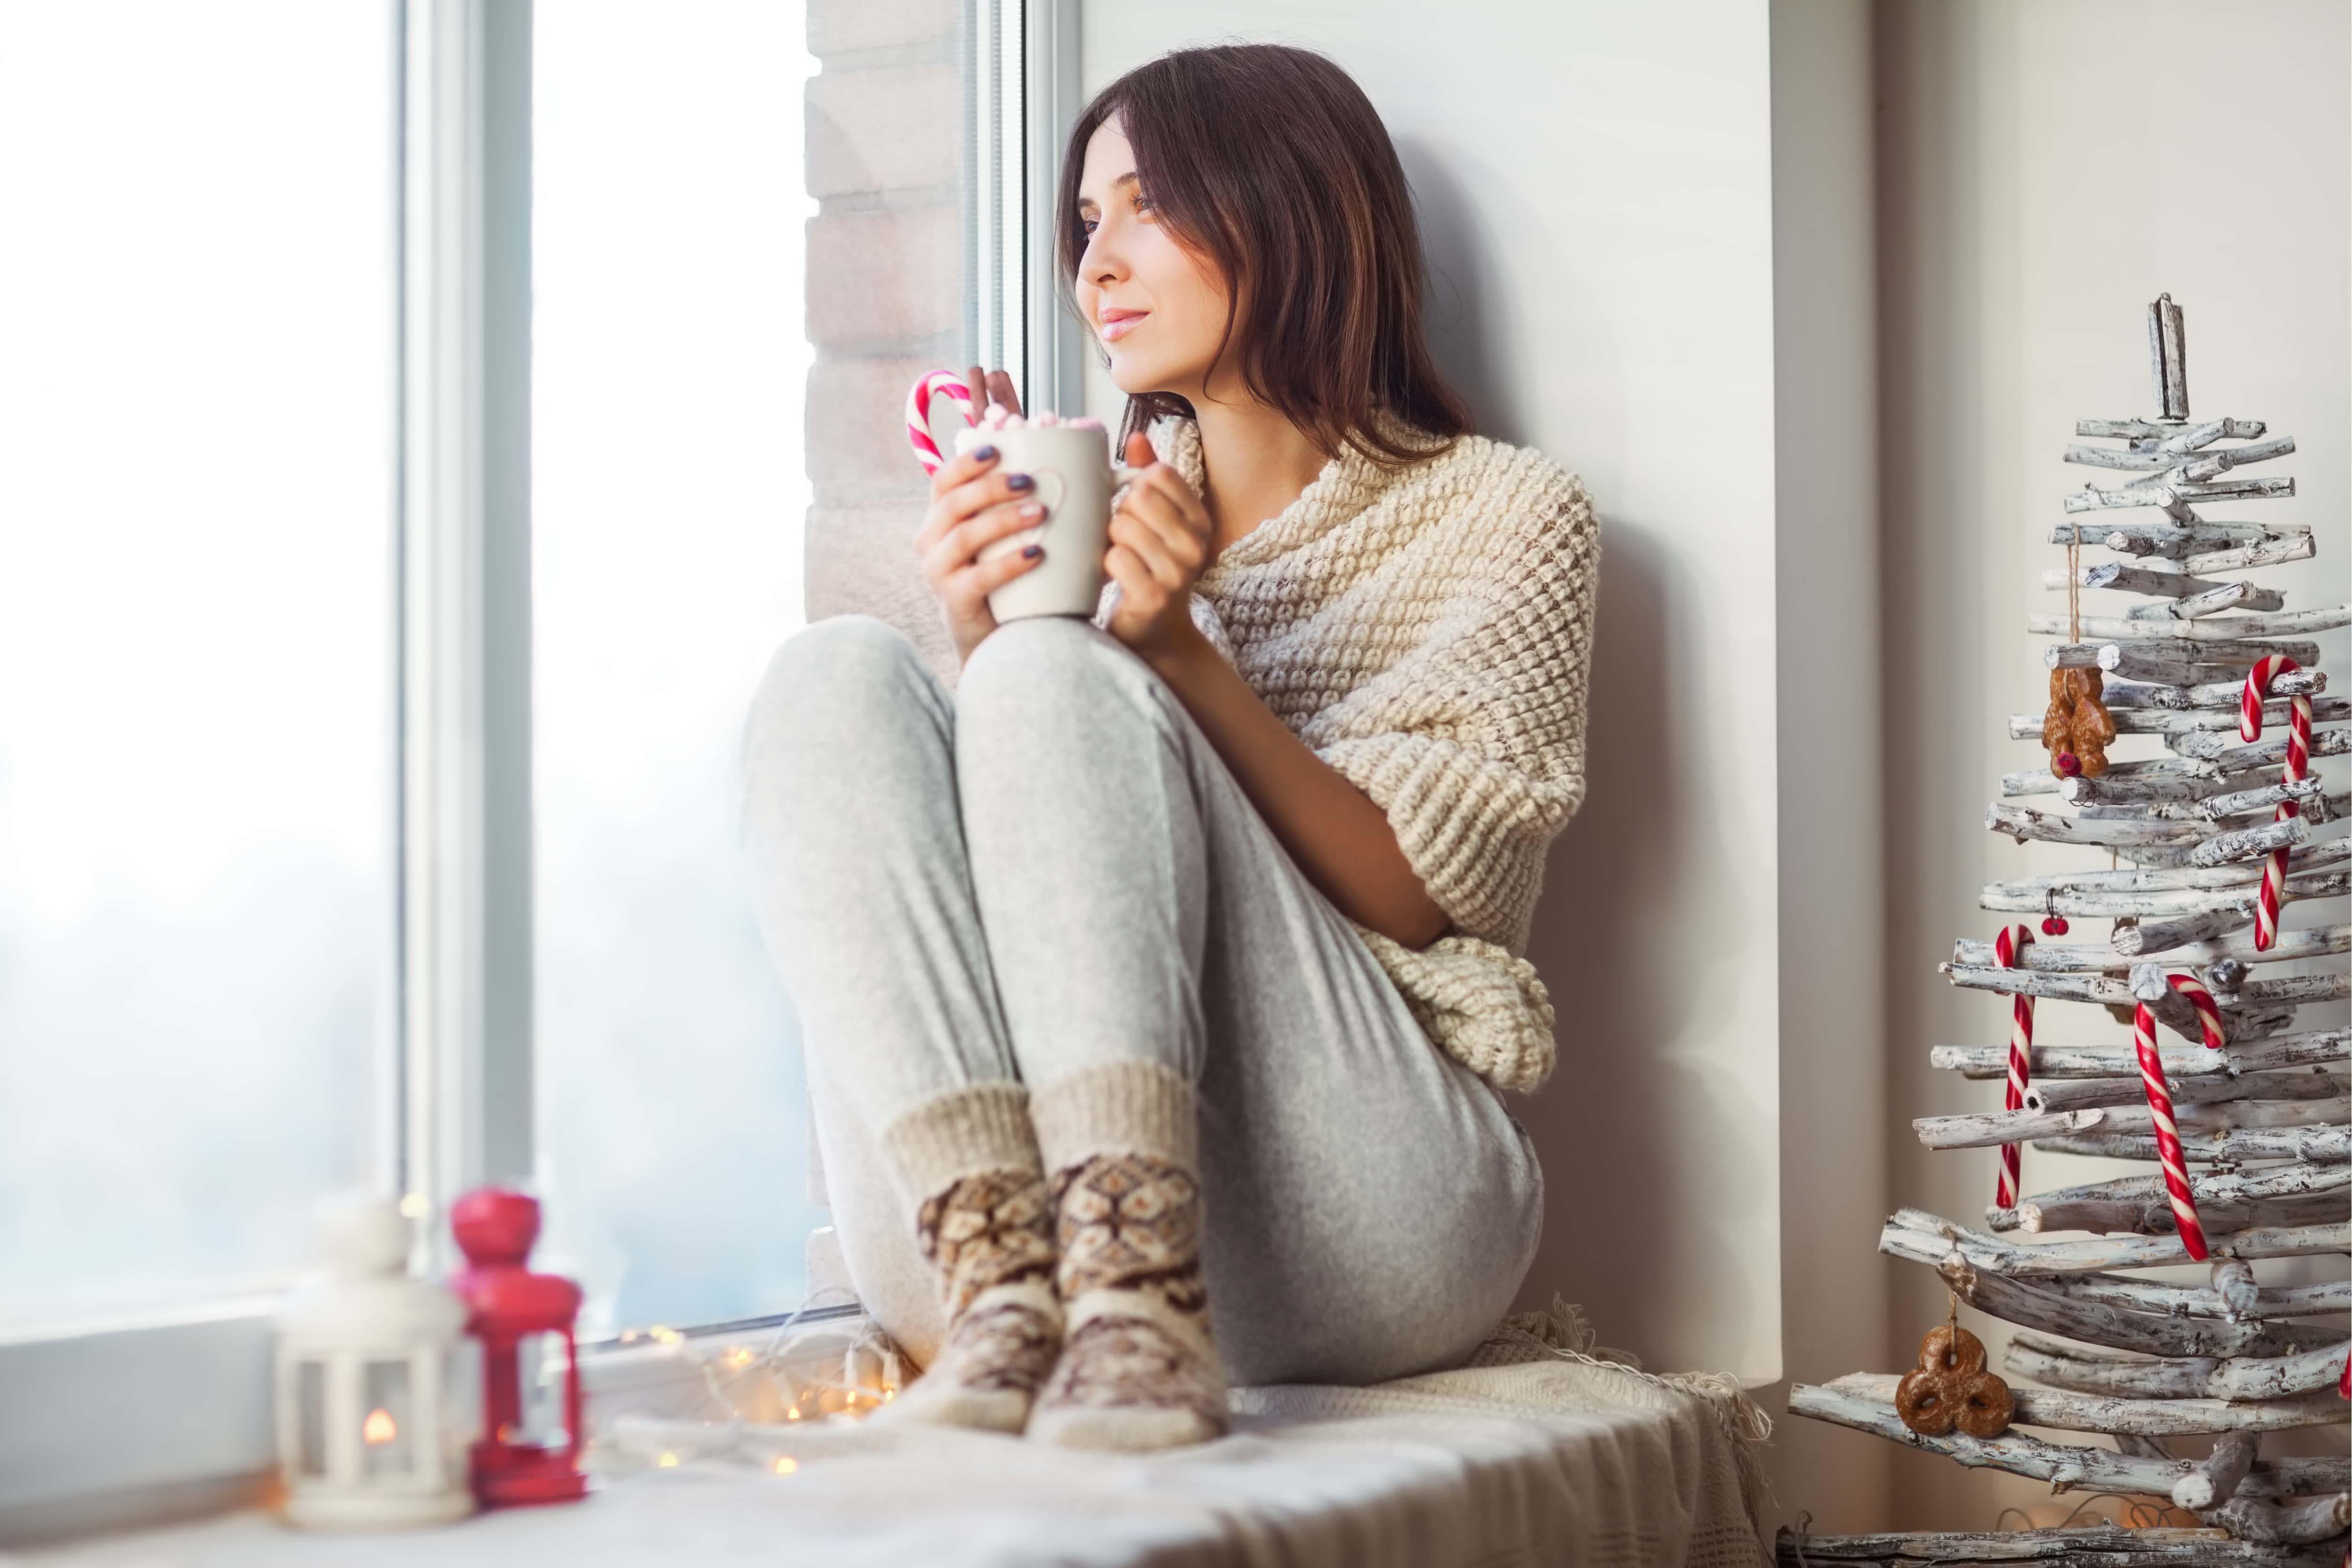 woman enjoying the christmas spirit